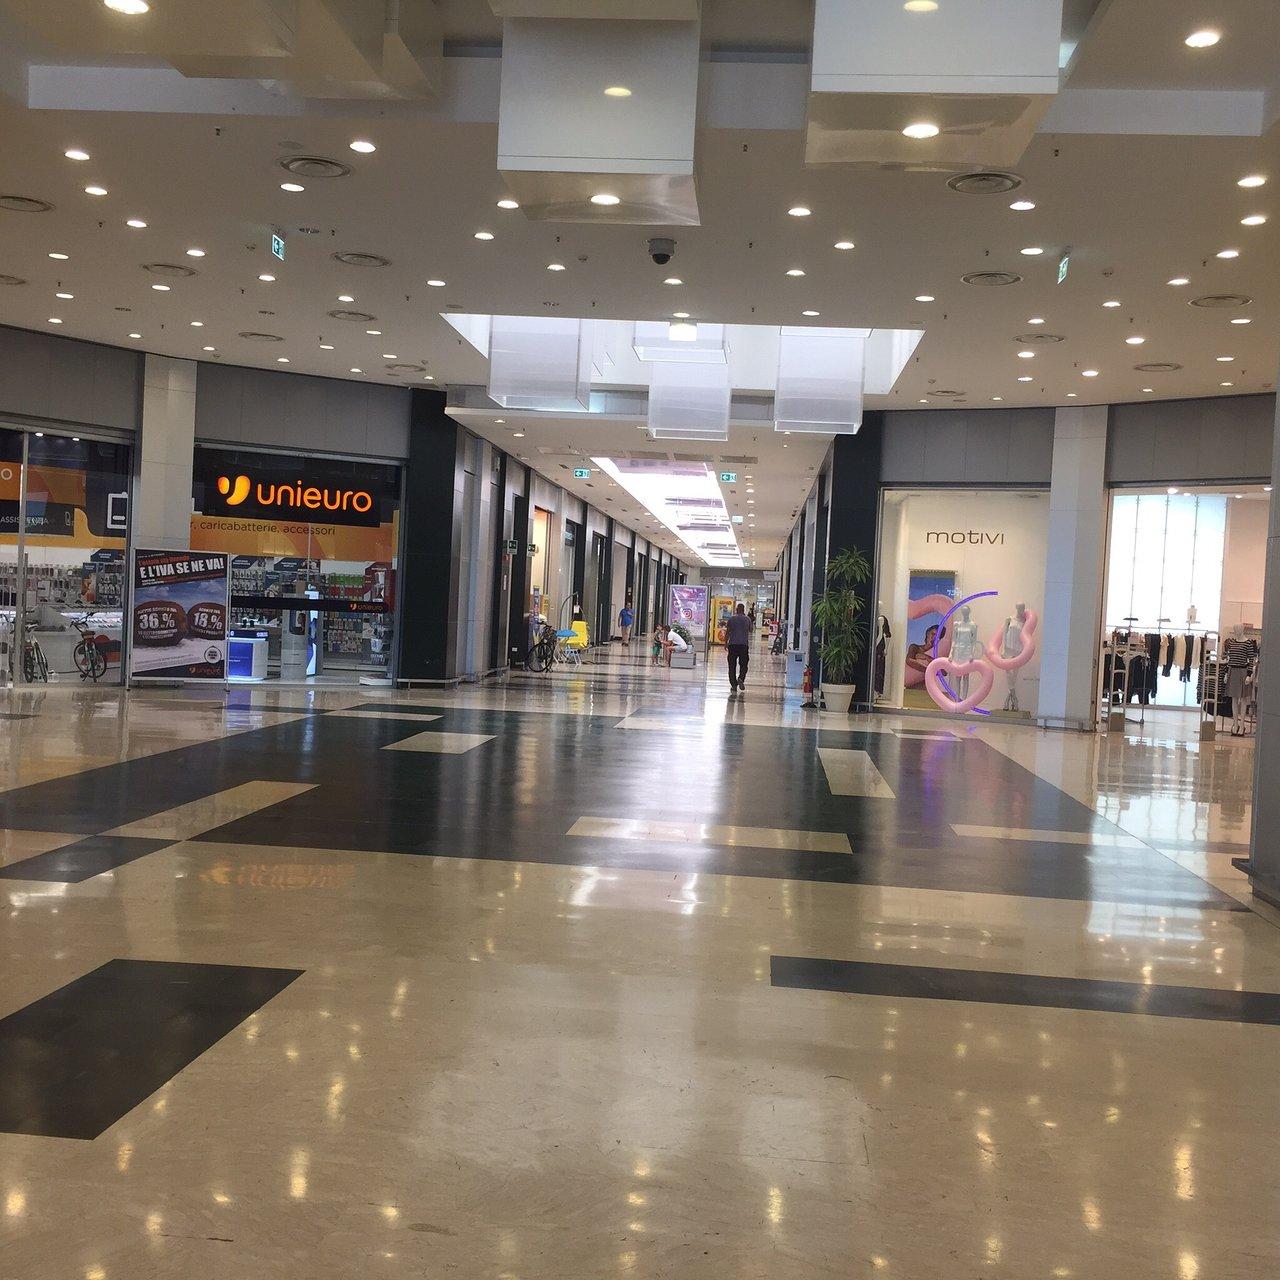 GEOX   Centro Commerciale Le Masserie